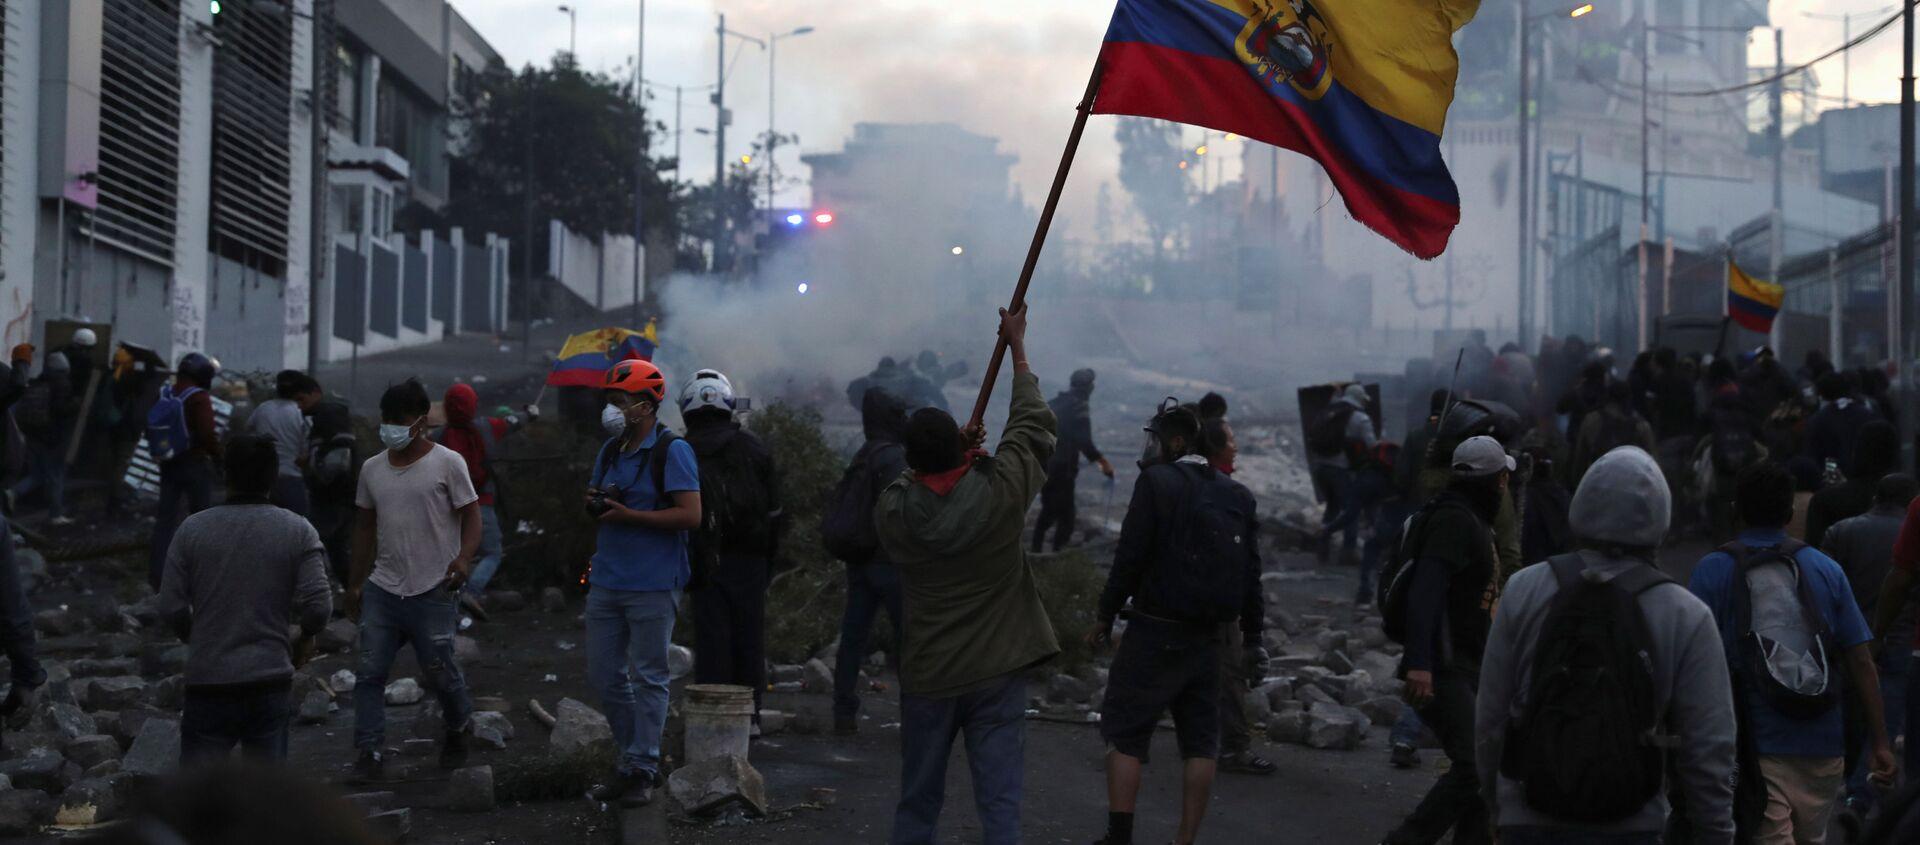 Protestas en Quito, Ecuador - Sputnik Mundo, 1920, 16.10.2019